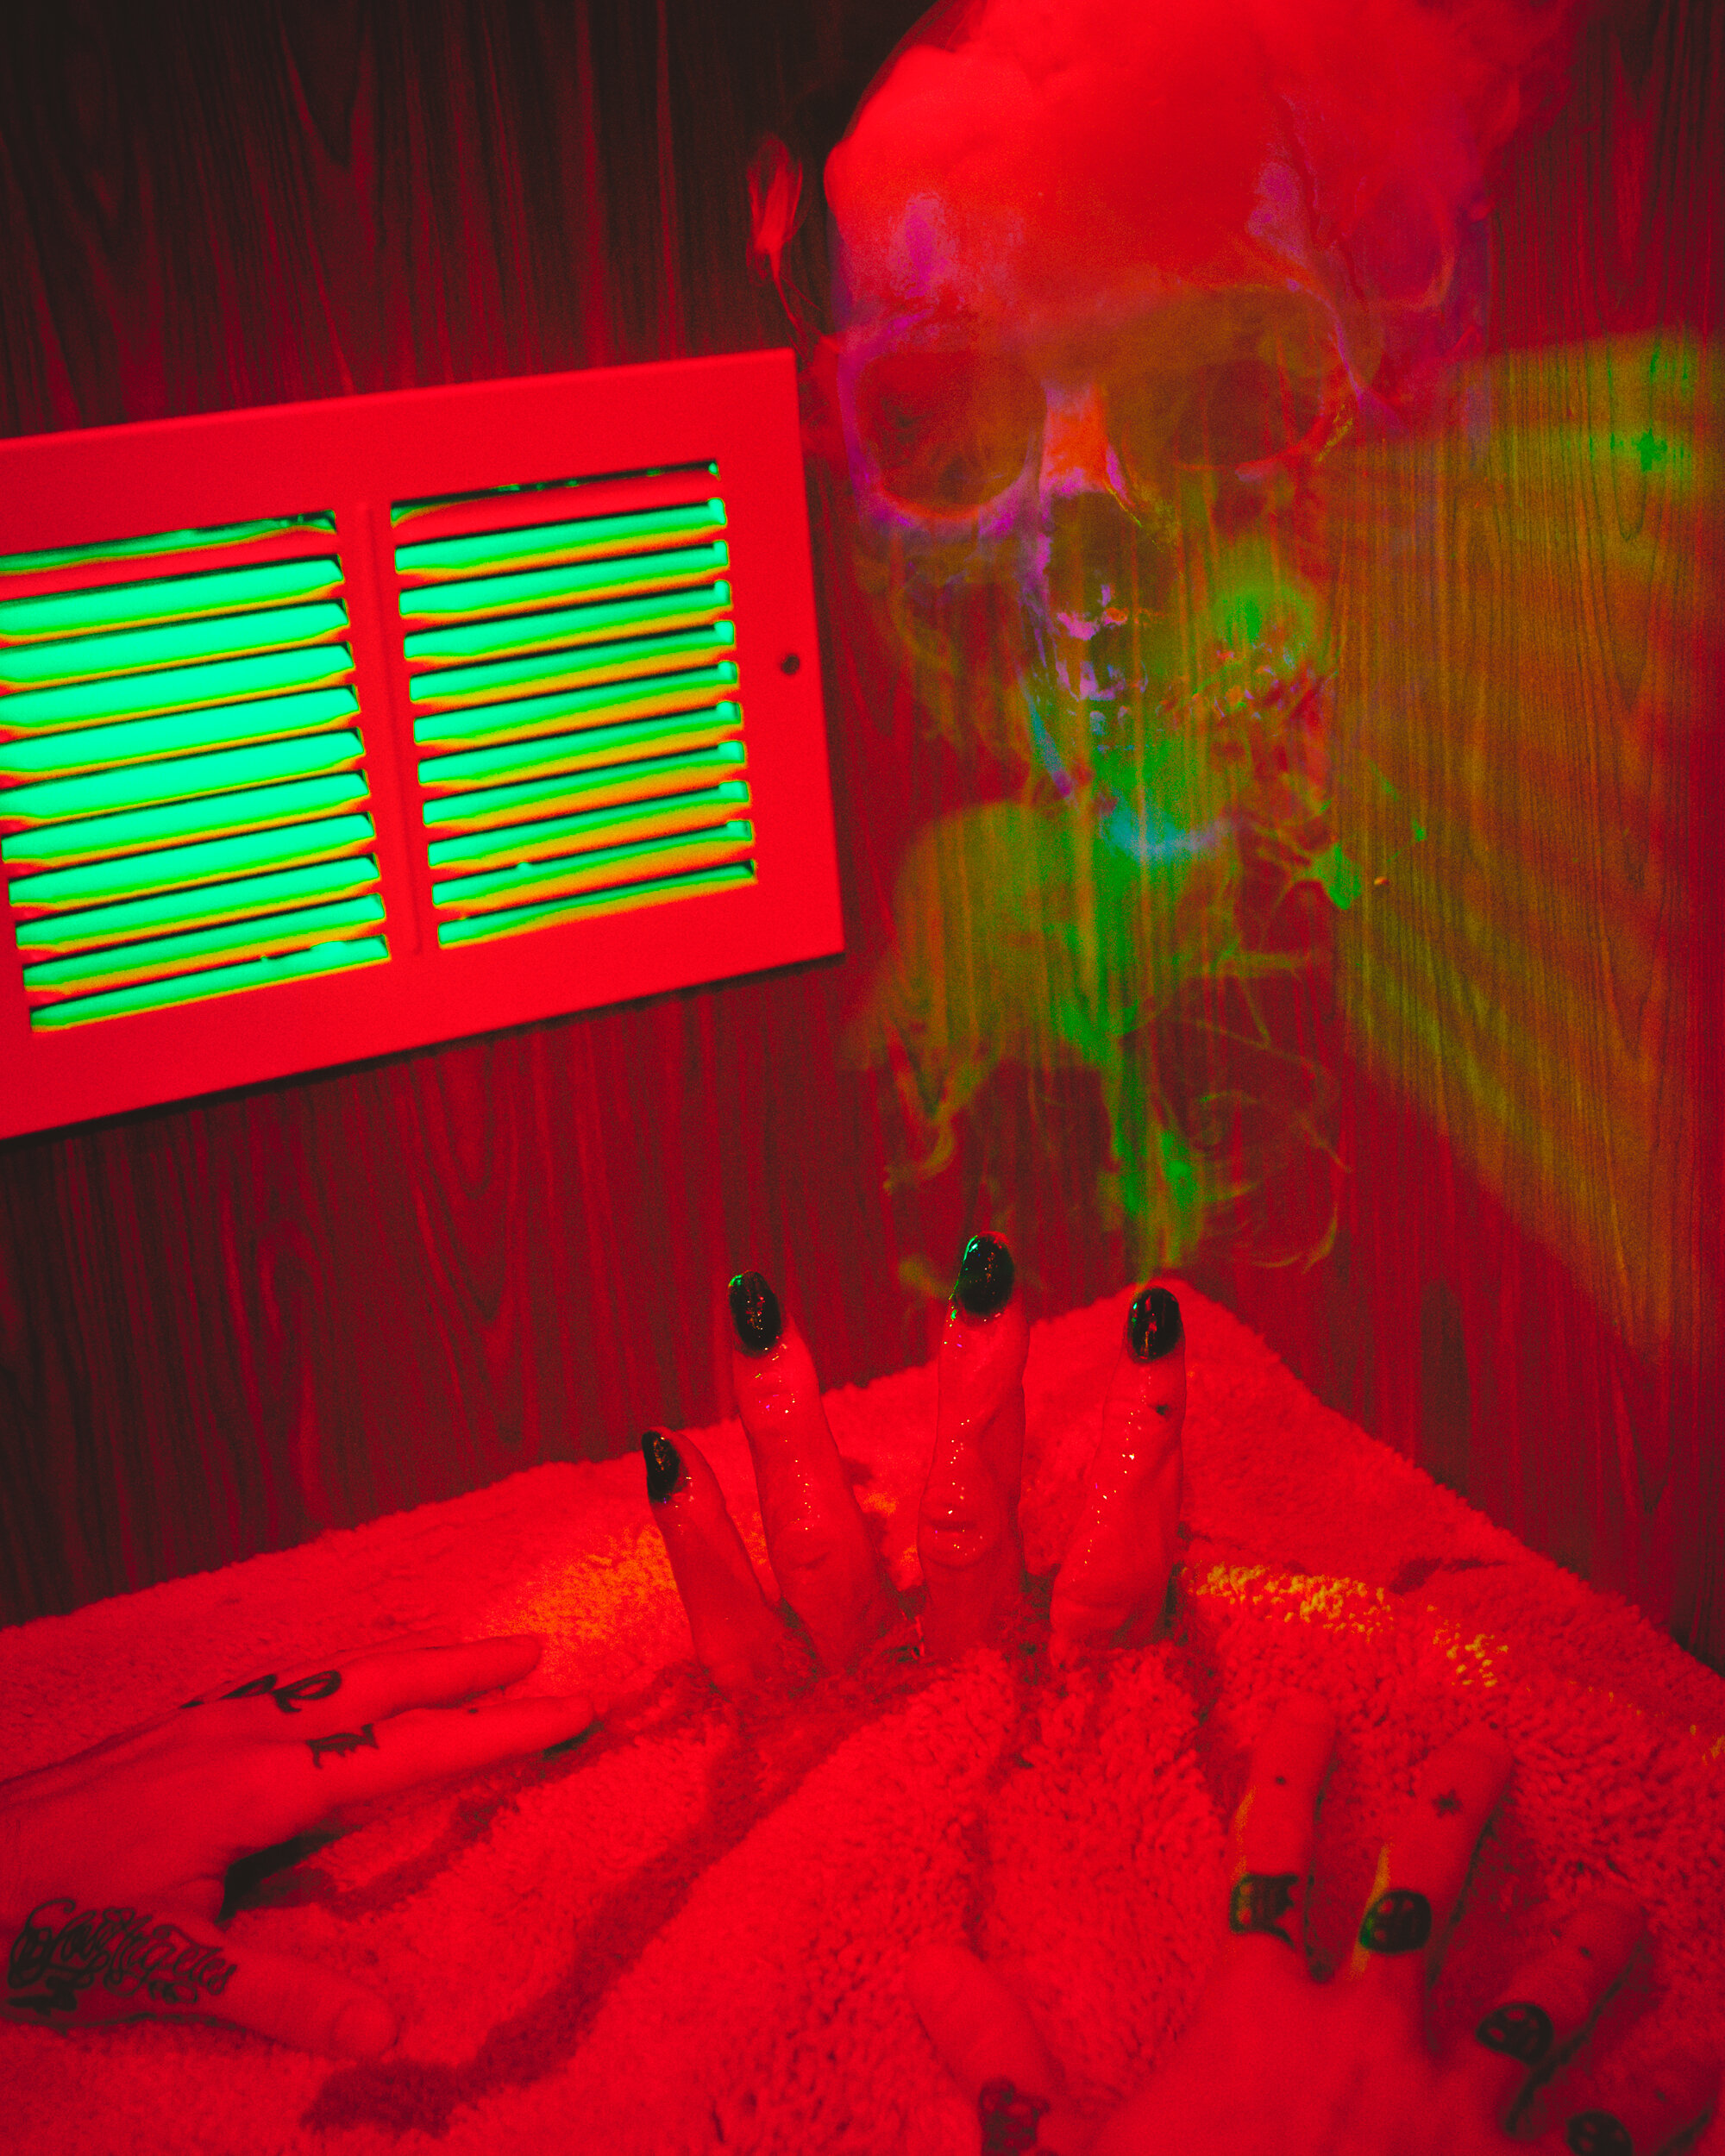 Demon Hand by Robert Hickerson